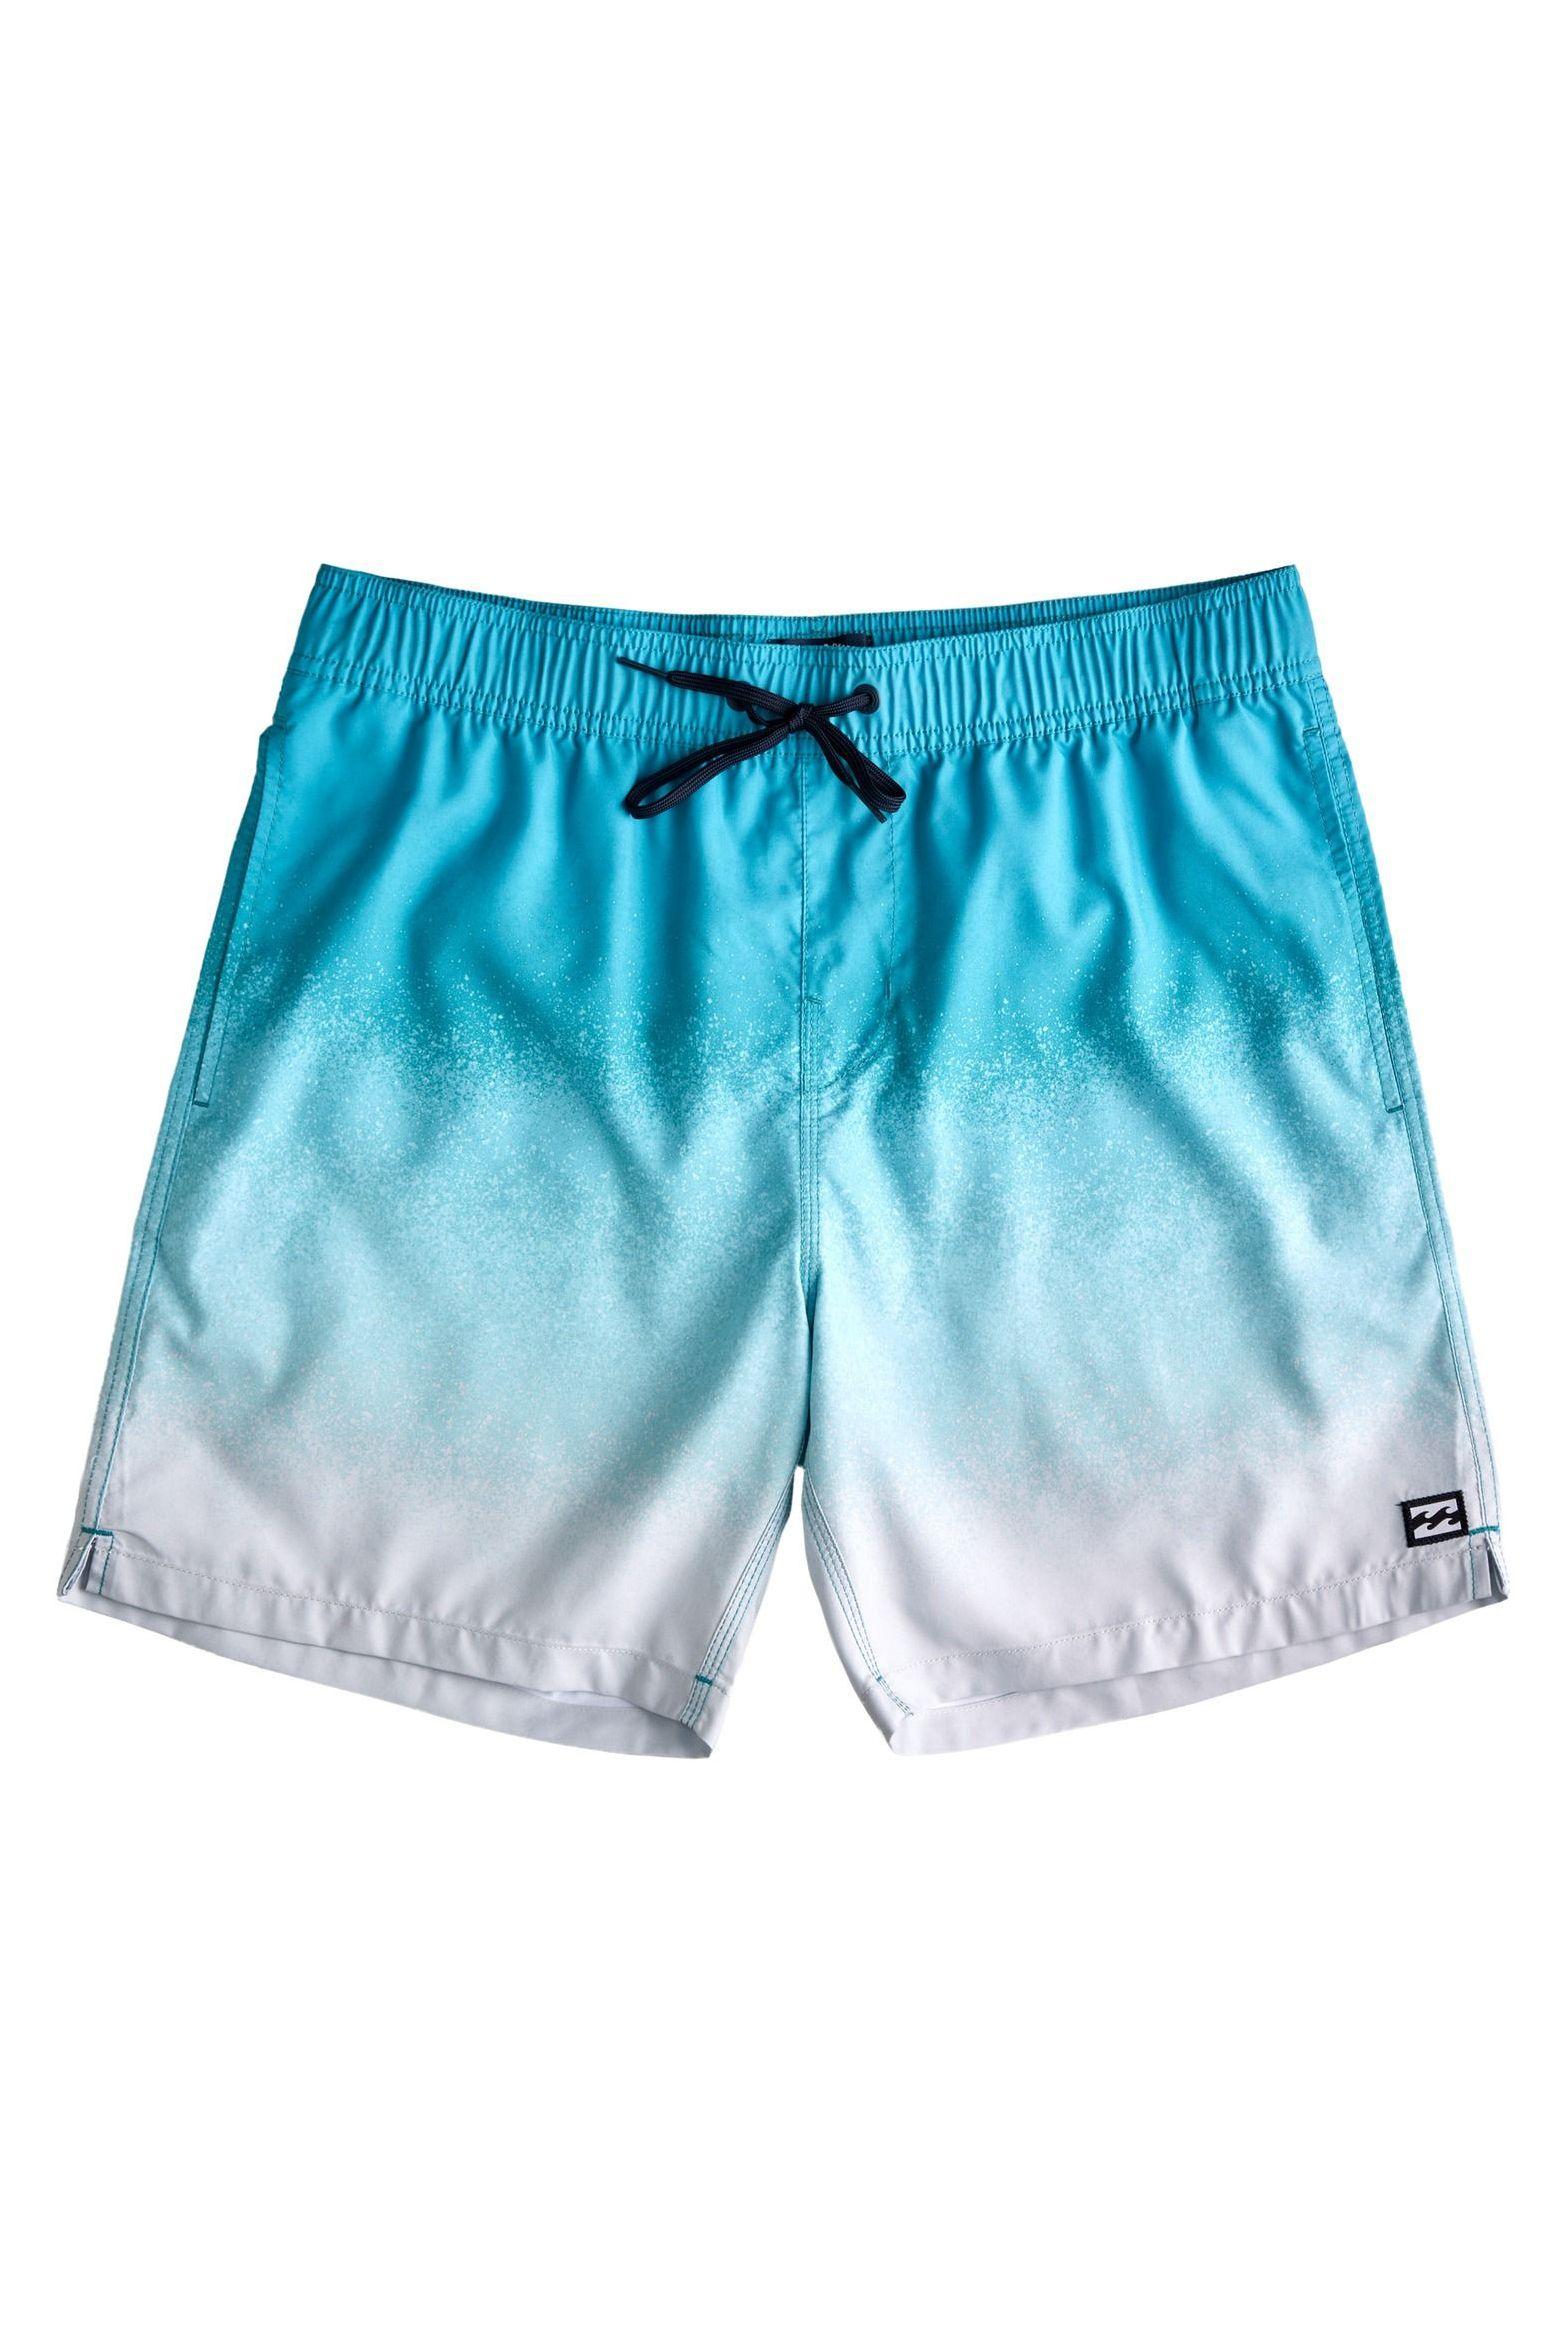 Billabong Boardshorts ALL DAY FADE PRO Aqua